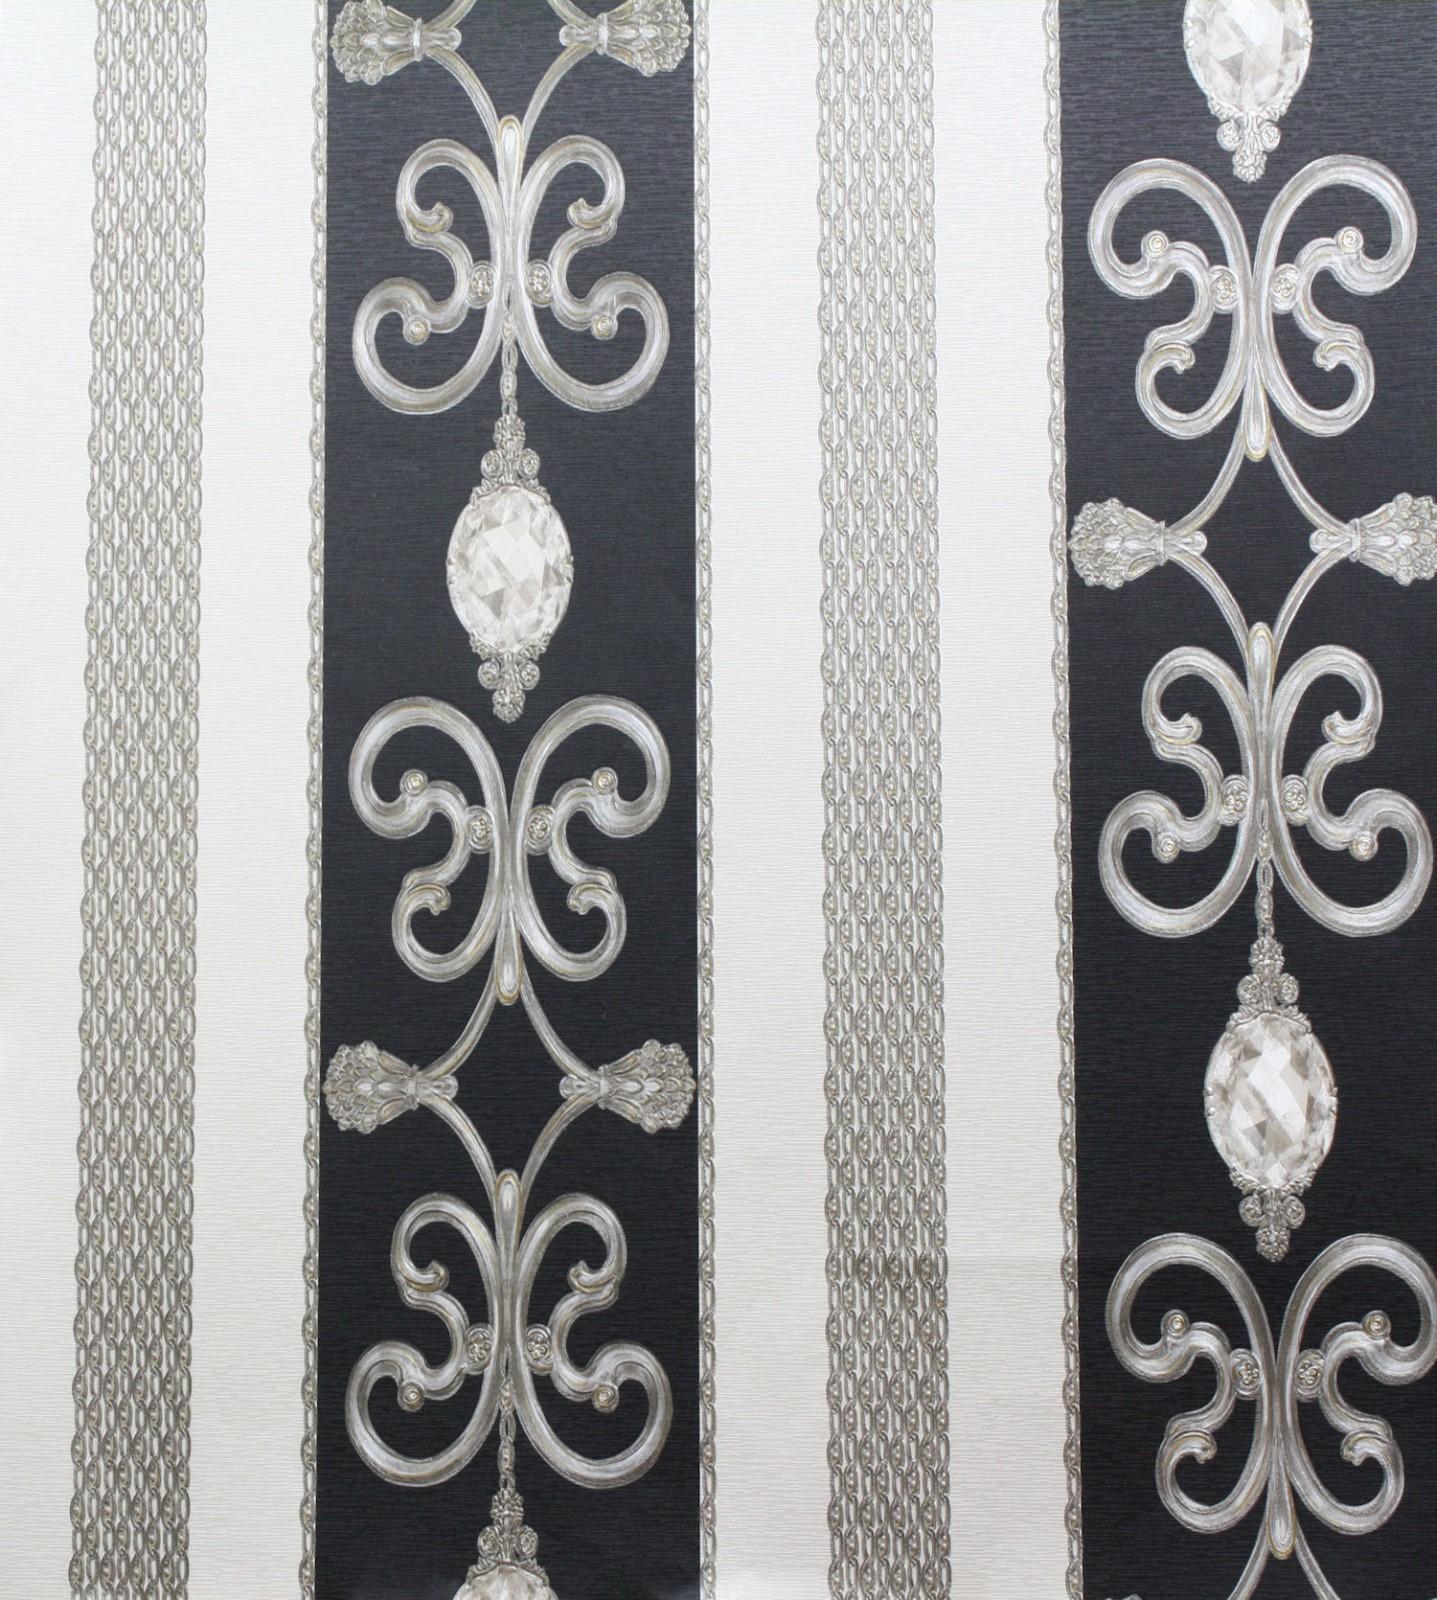 hermitage 8 barock satin tapete 8913 34 891334 schwarz With balkon teppich mit hermitage 8 barock satin tapete